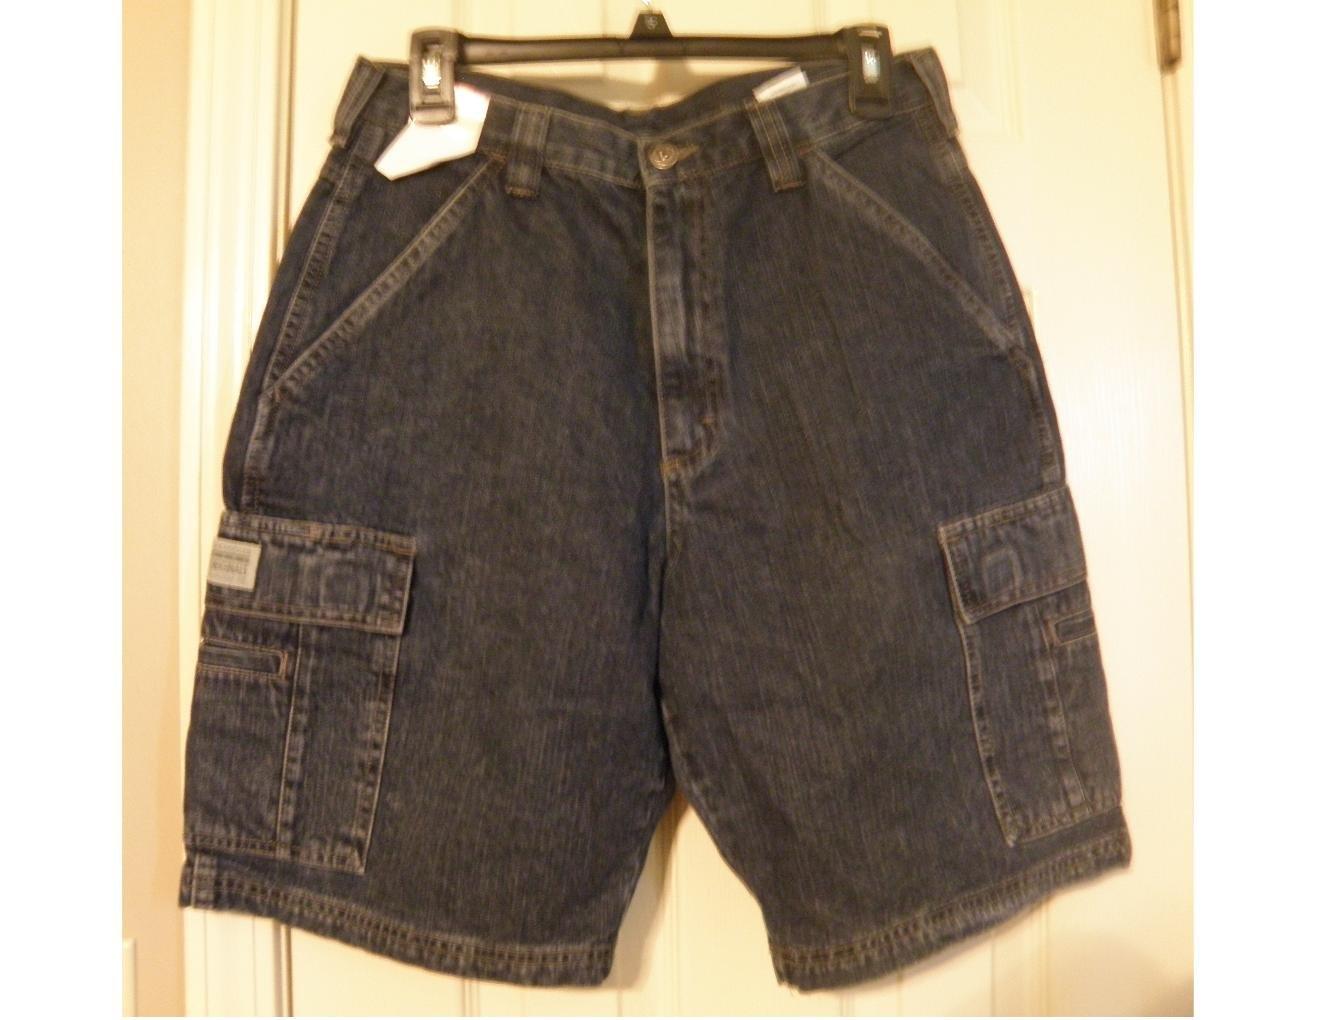 NEW Mens 30 Wrangler Denim Jean Cargo Shorts Heavy Weight Loose Fit